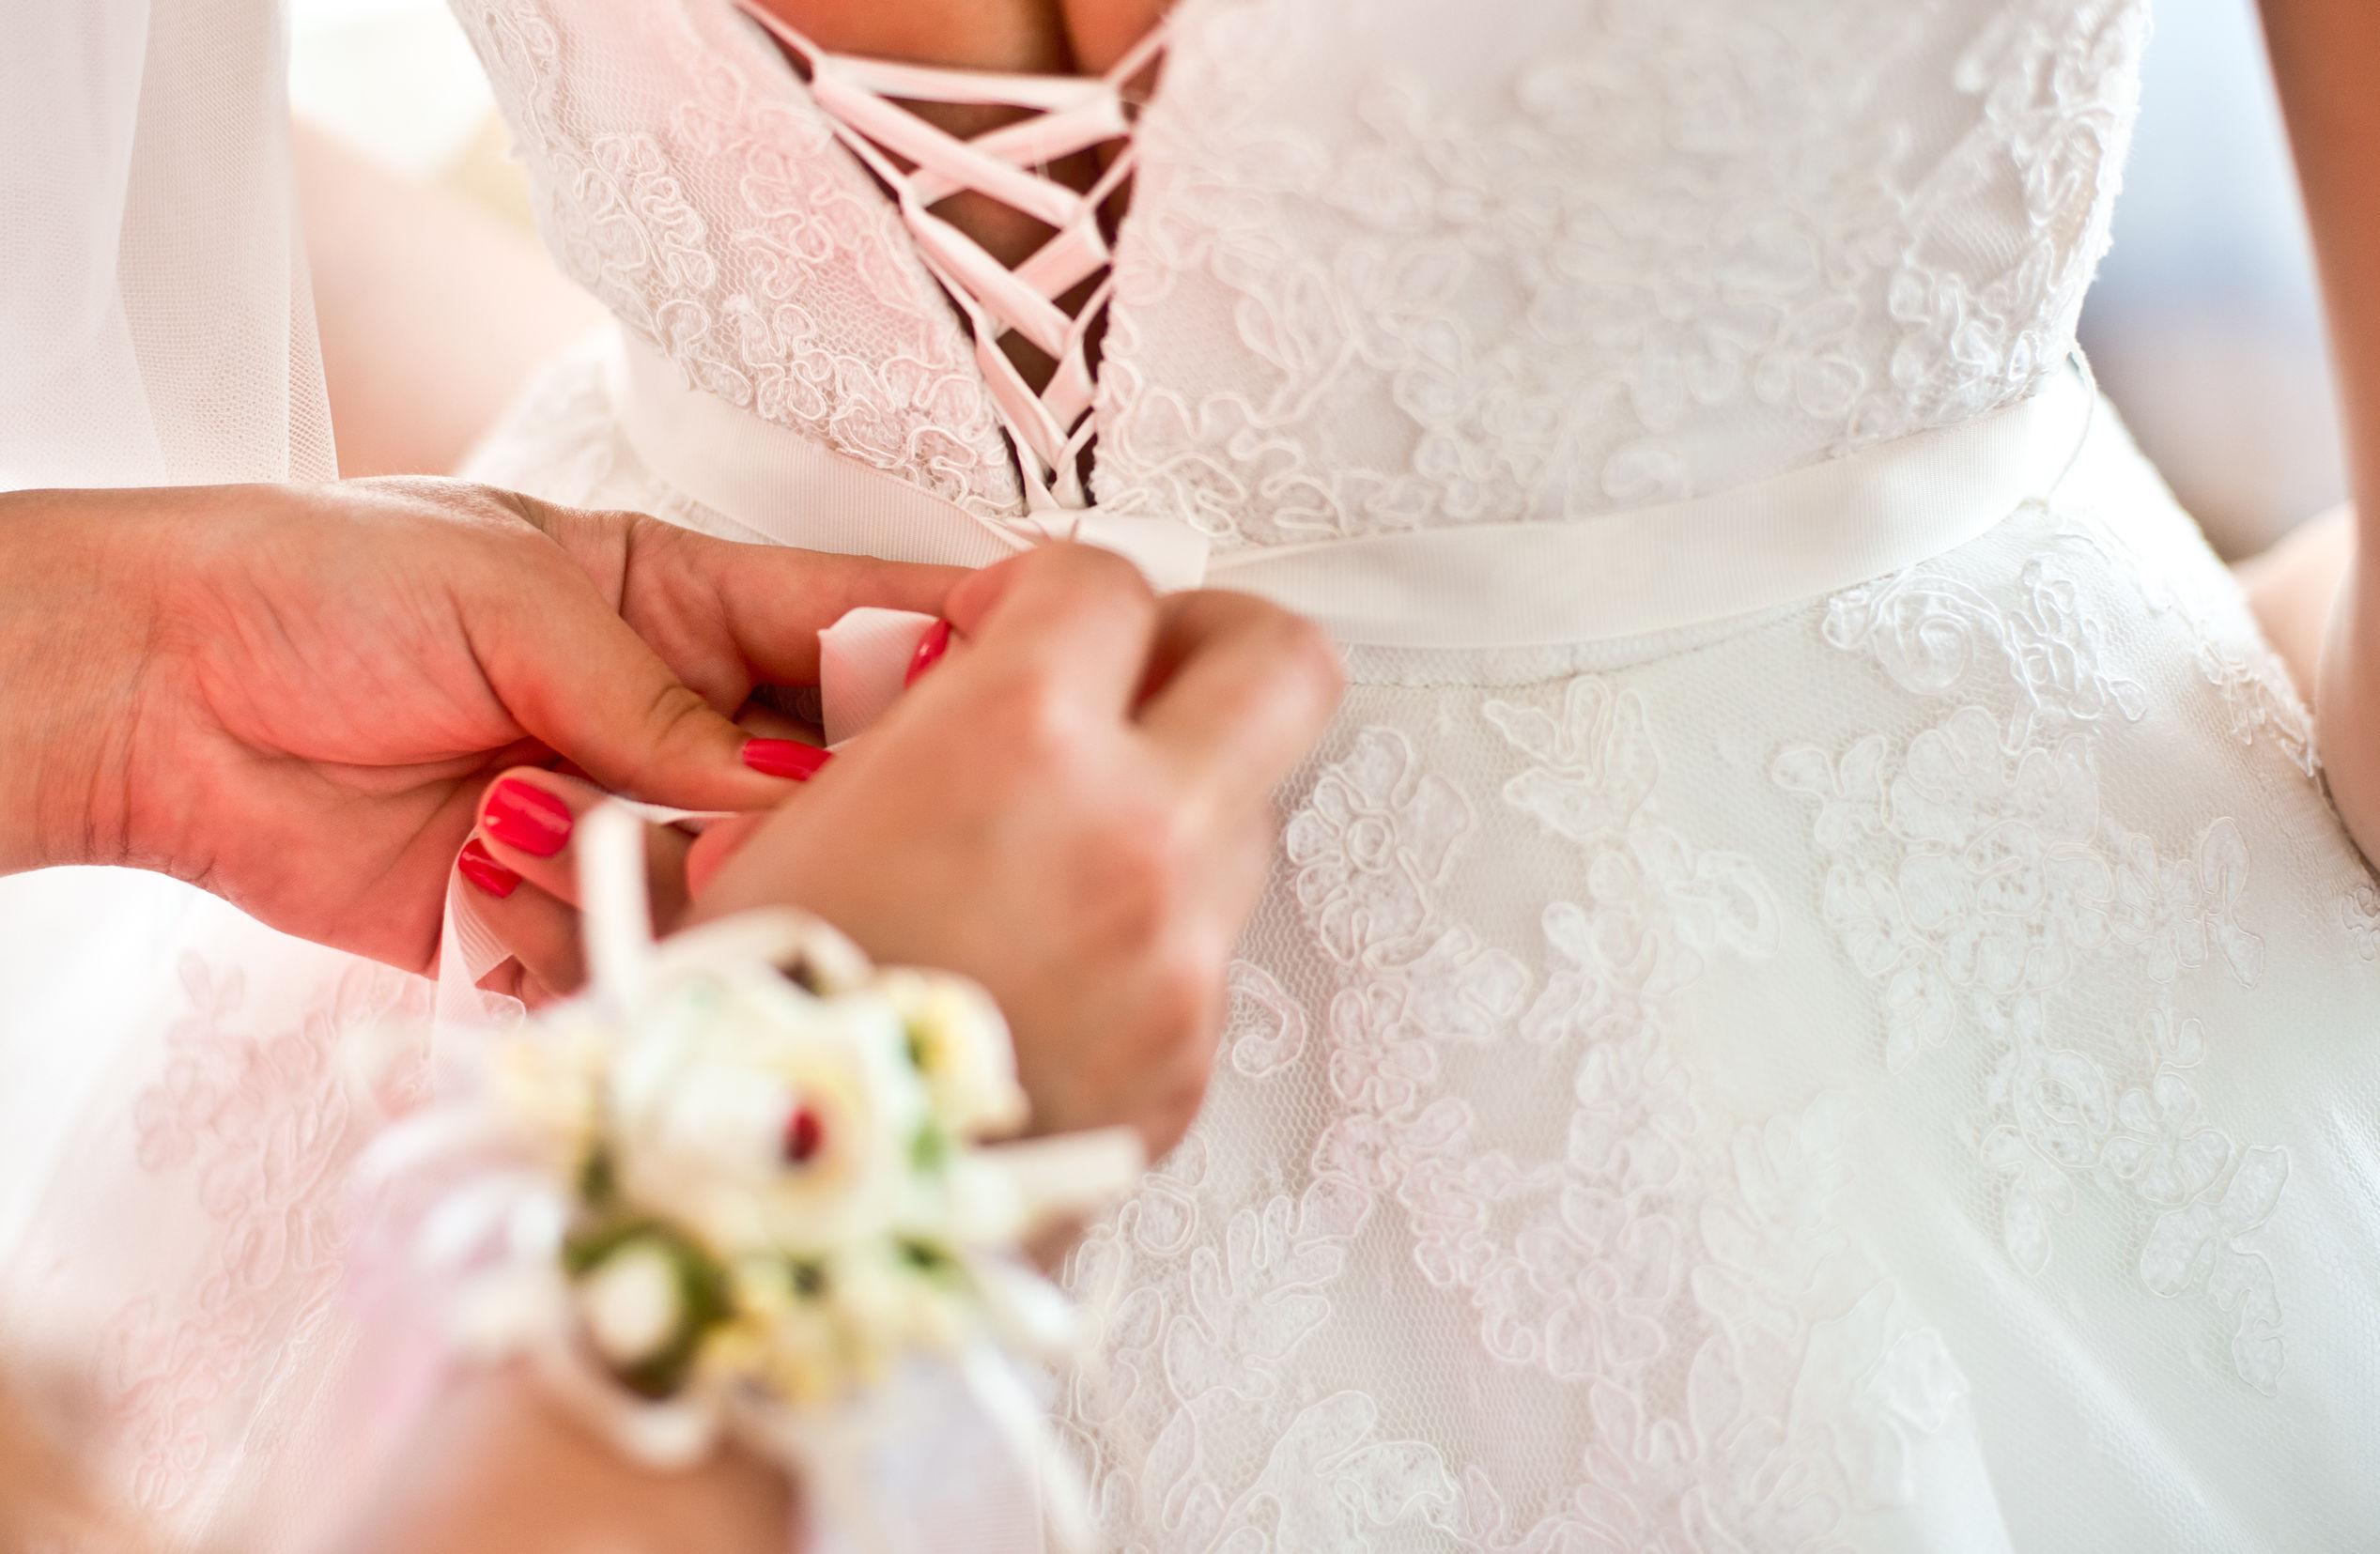 wedding dress cleaning auckland wedding dress storage box Wedding Dress Storage Box Auckland Dresses